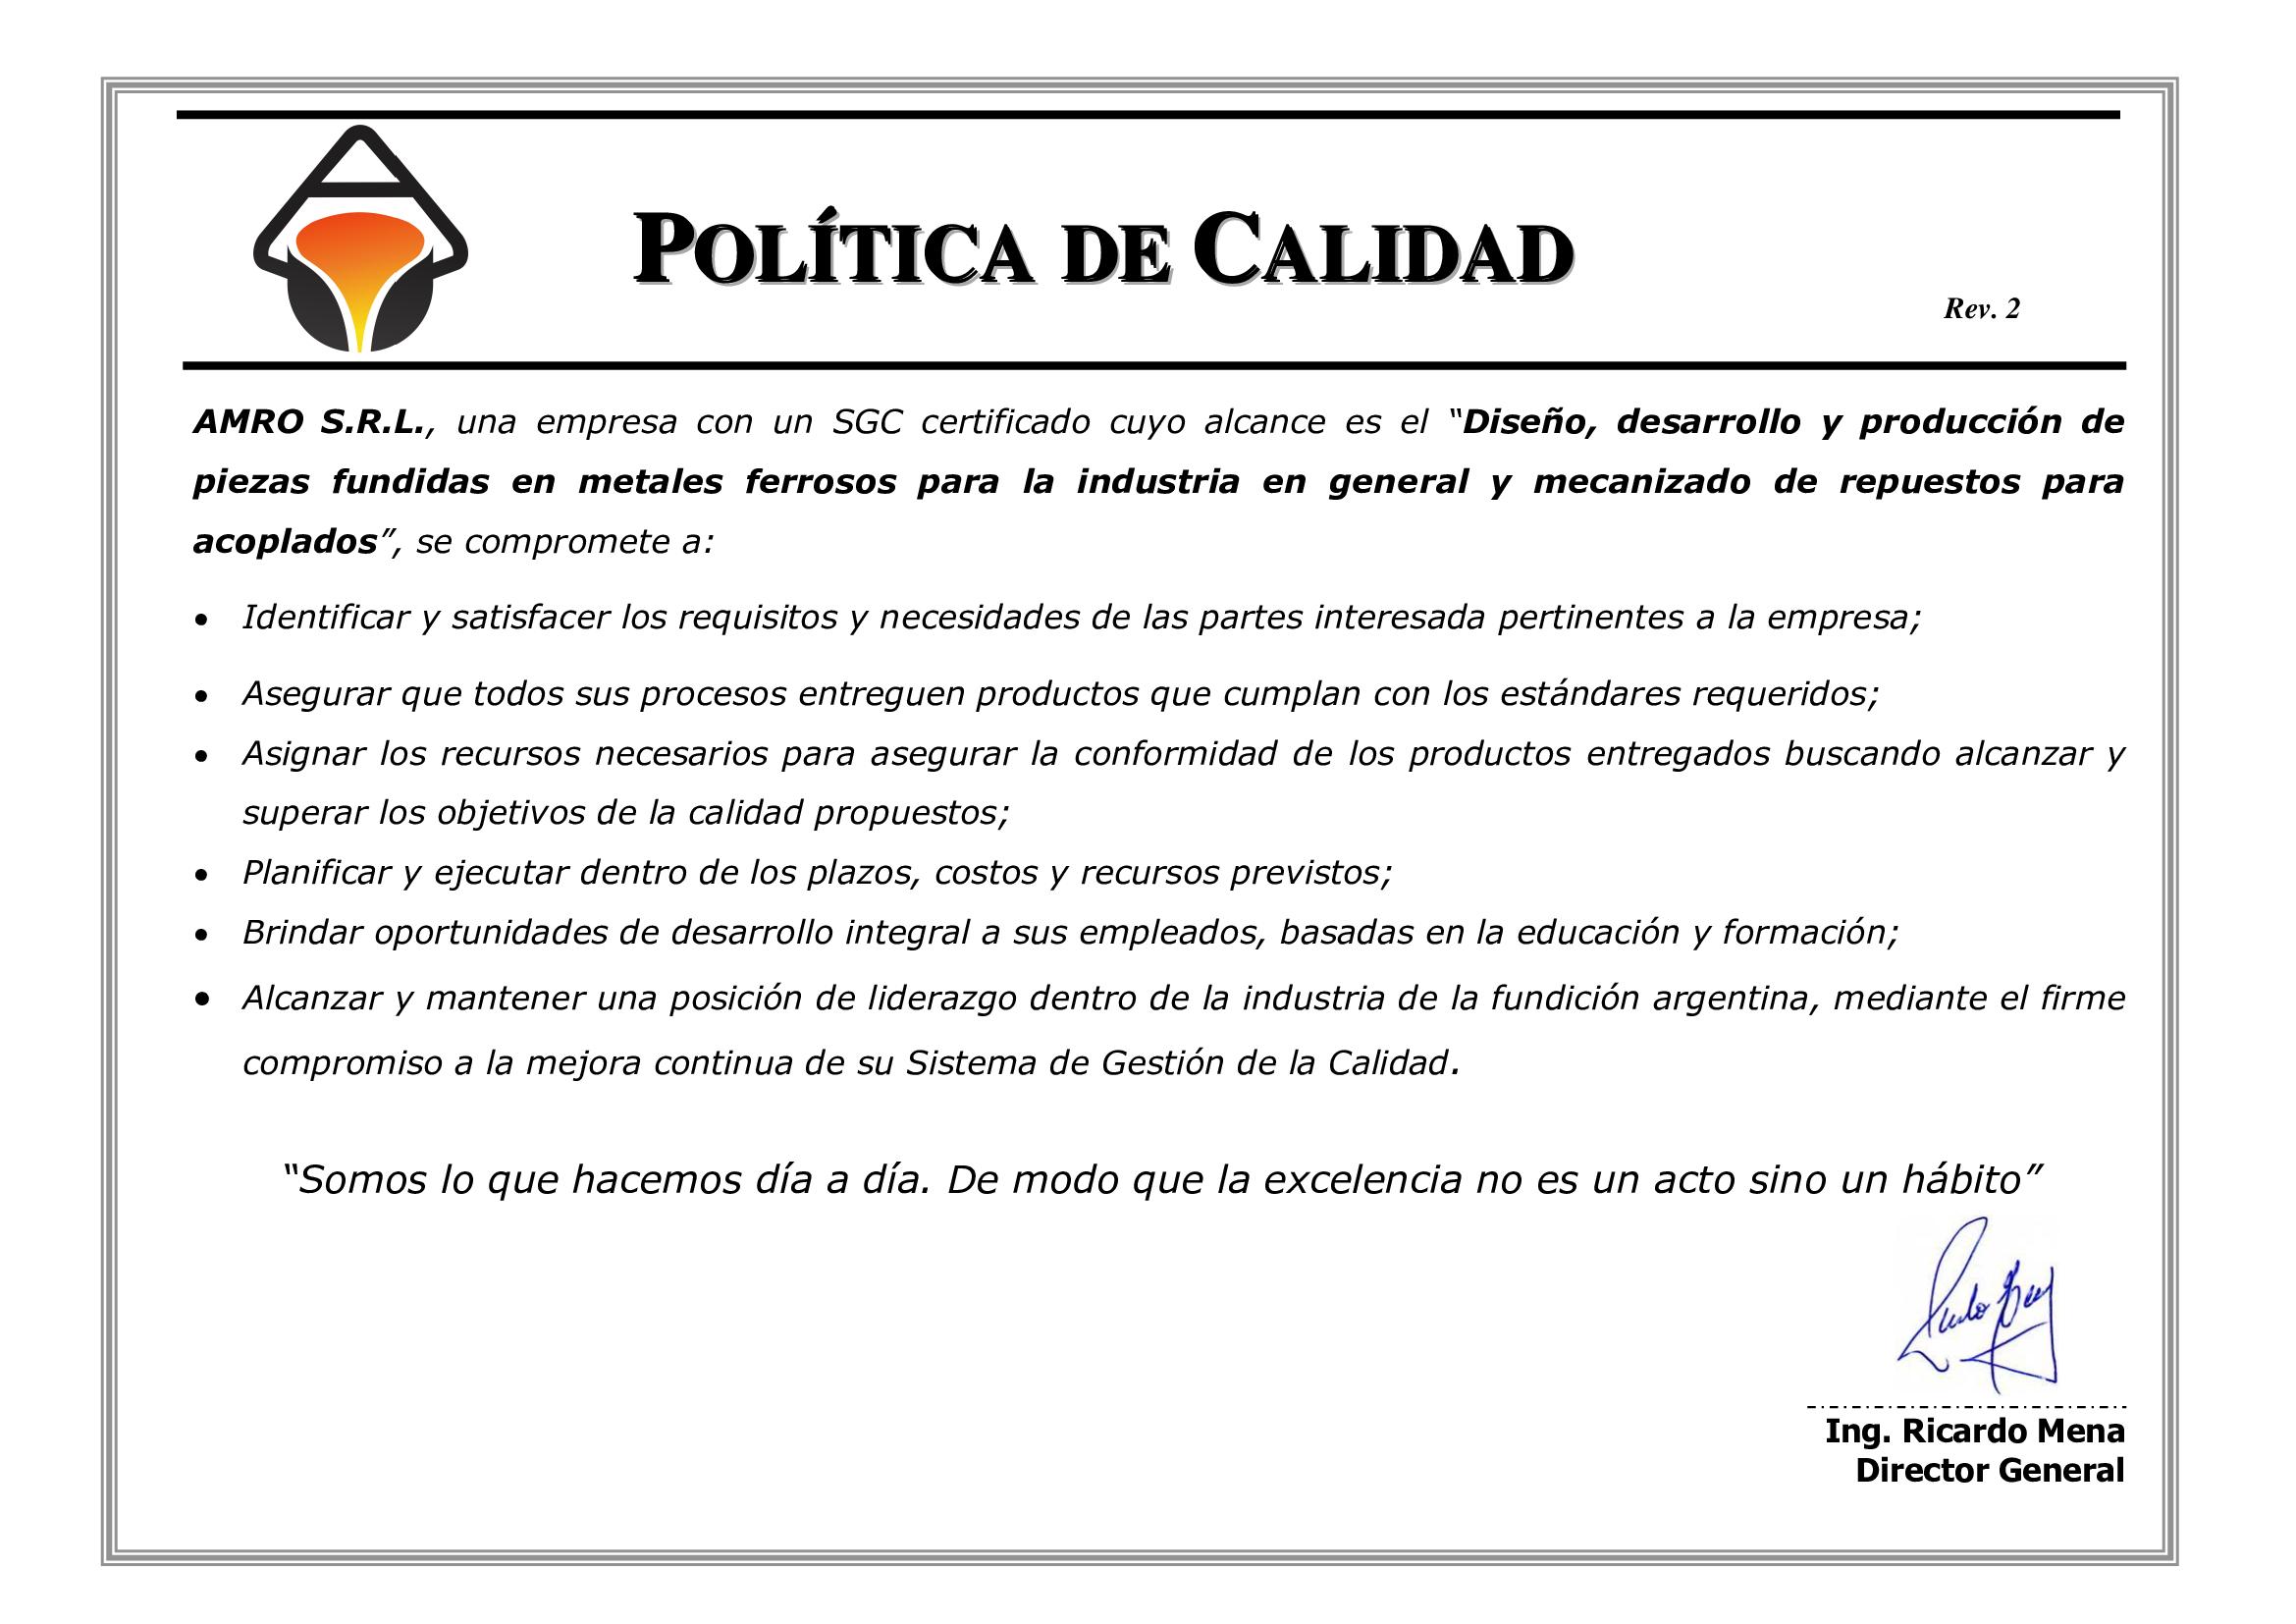 POL-001-002-Politica-de-la-Calidad-_1_